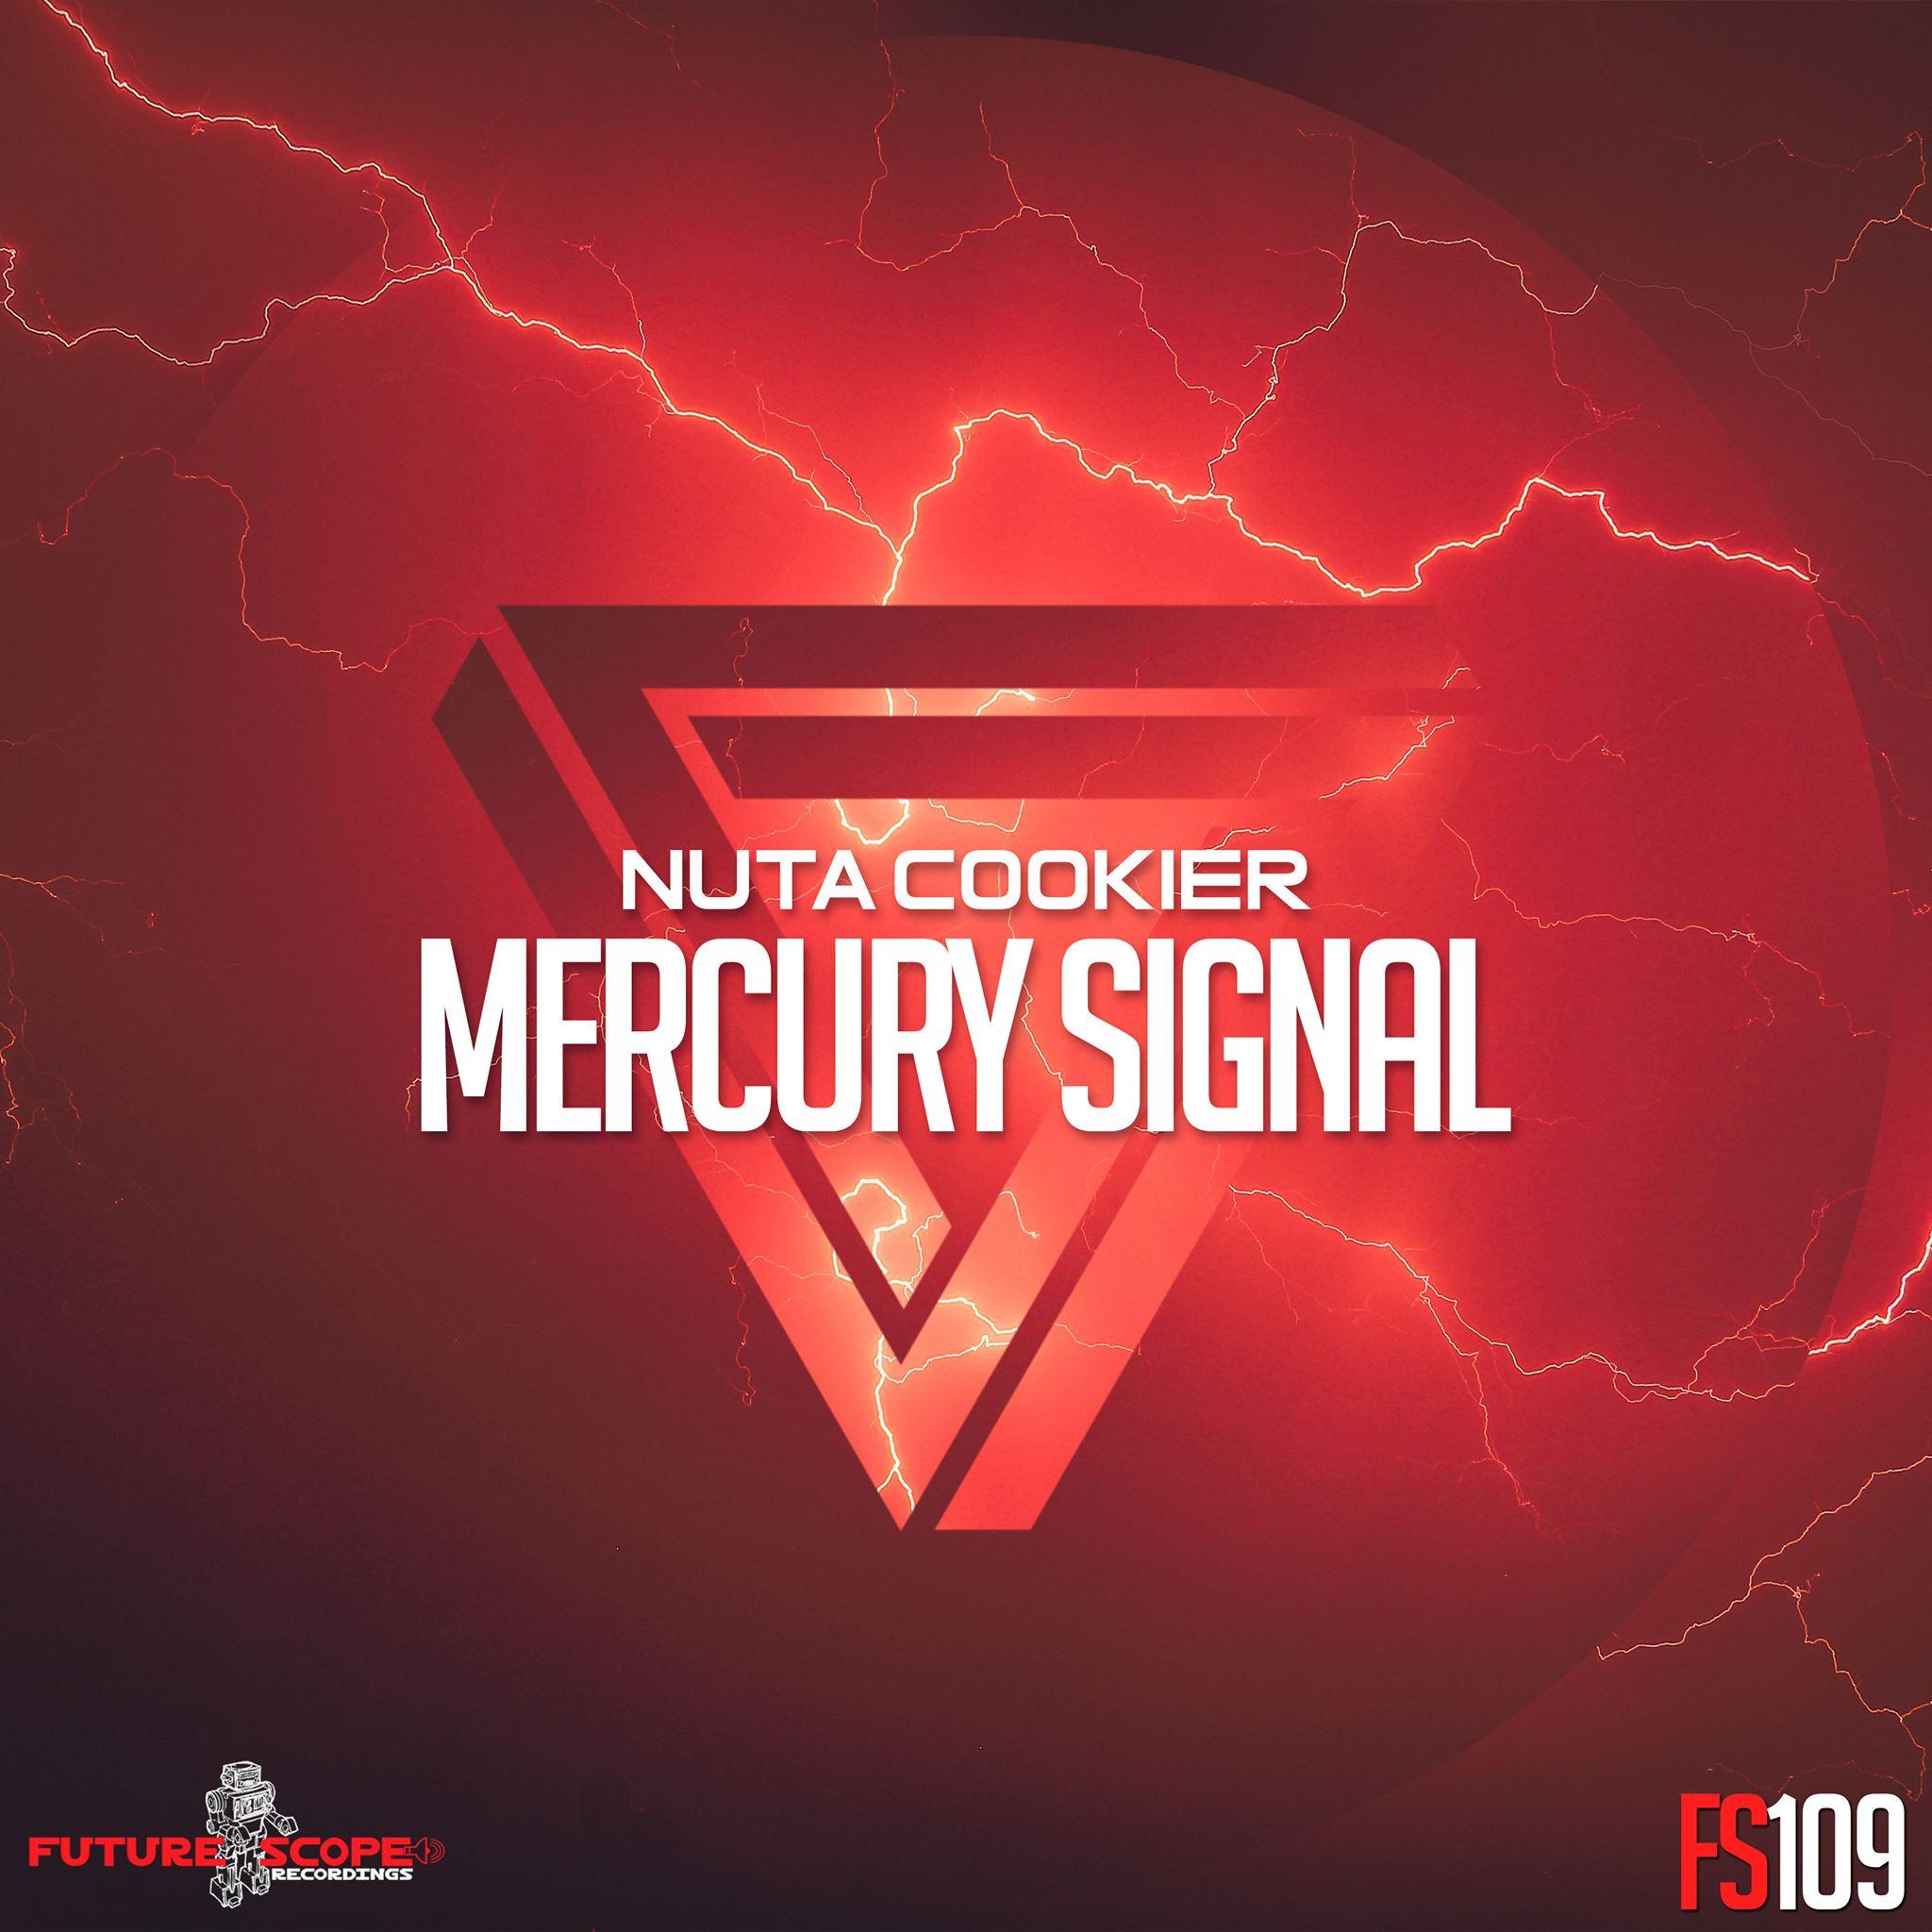 Nuta Cookier – Mercury Signal (Future Scope)